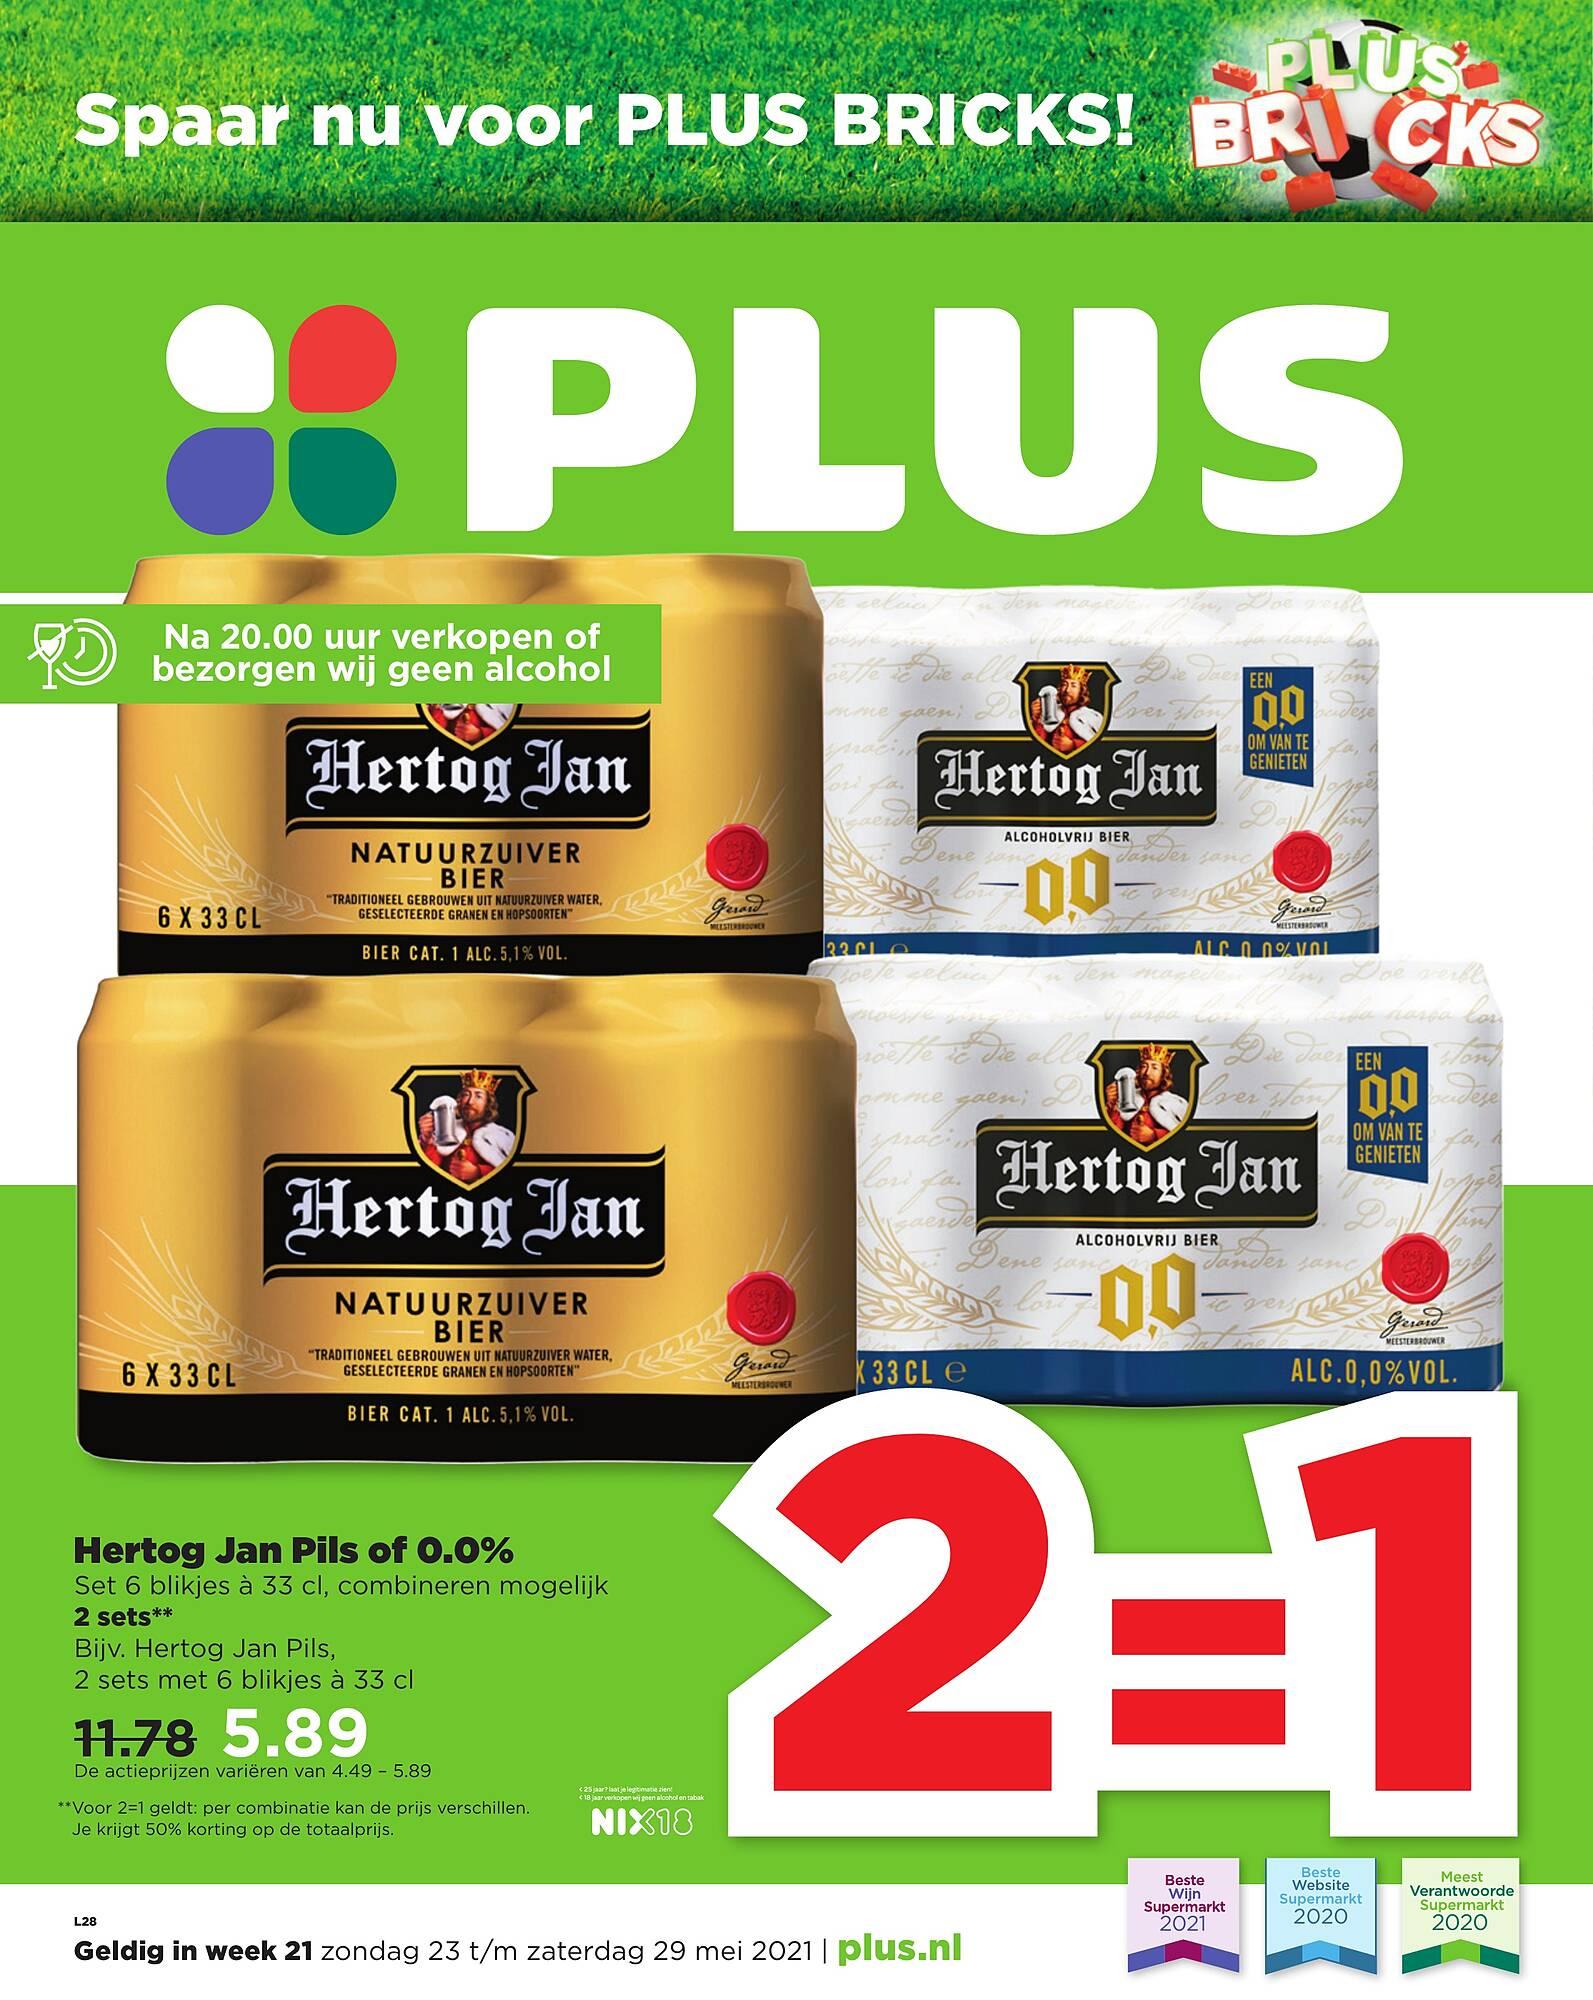 2=1 Hertog Jan Pils of 0.0% @ Plus